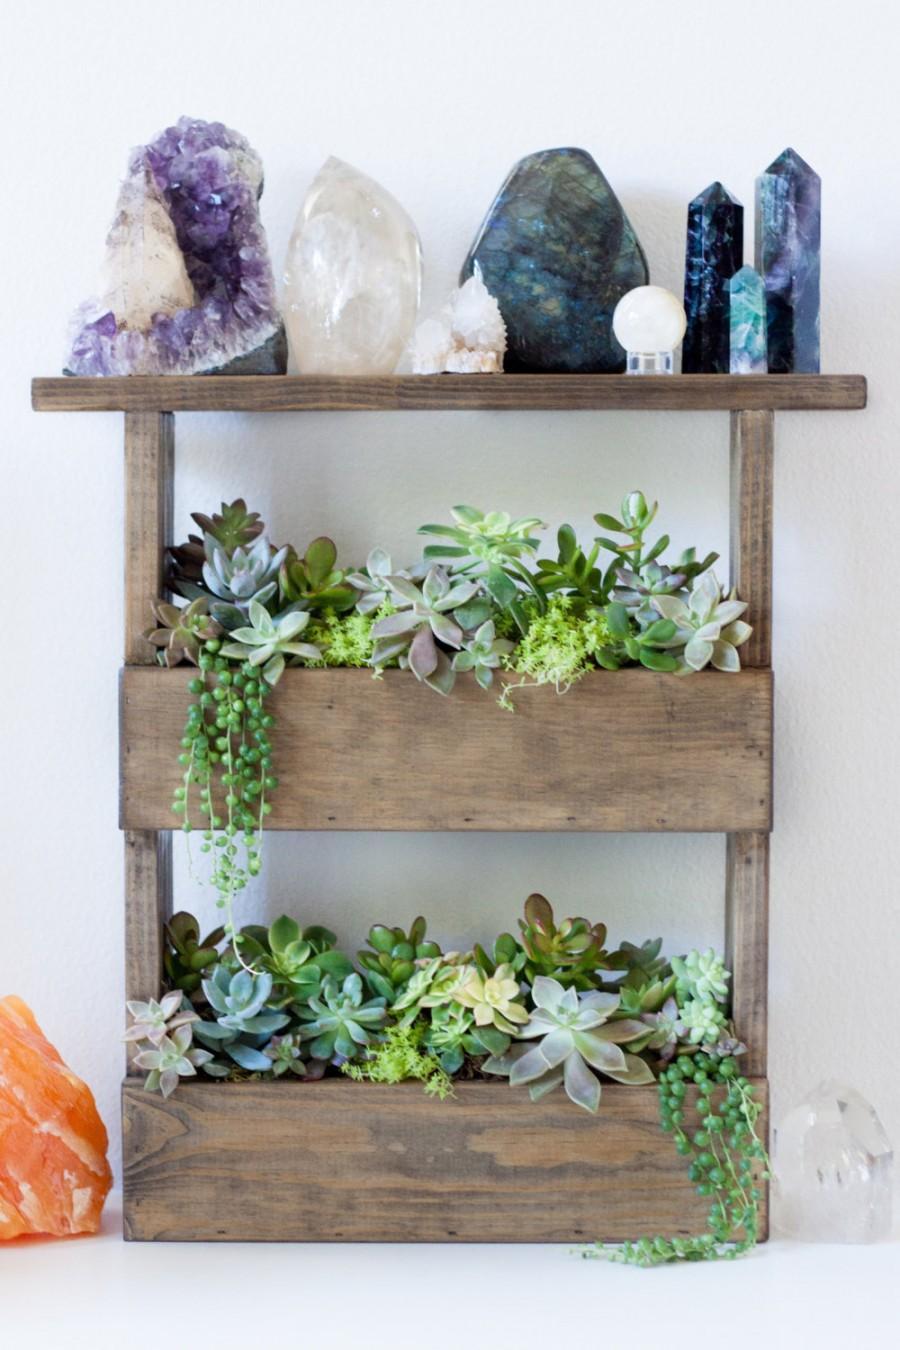 Vertical Wall Planter Box Pallet Style Crystal Display Shelf 2749245 Weddbook